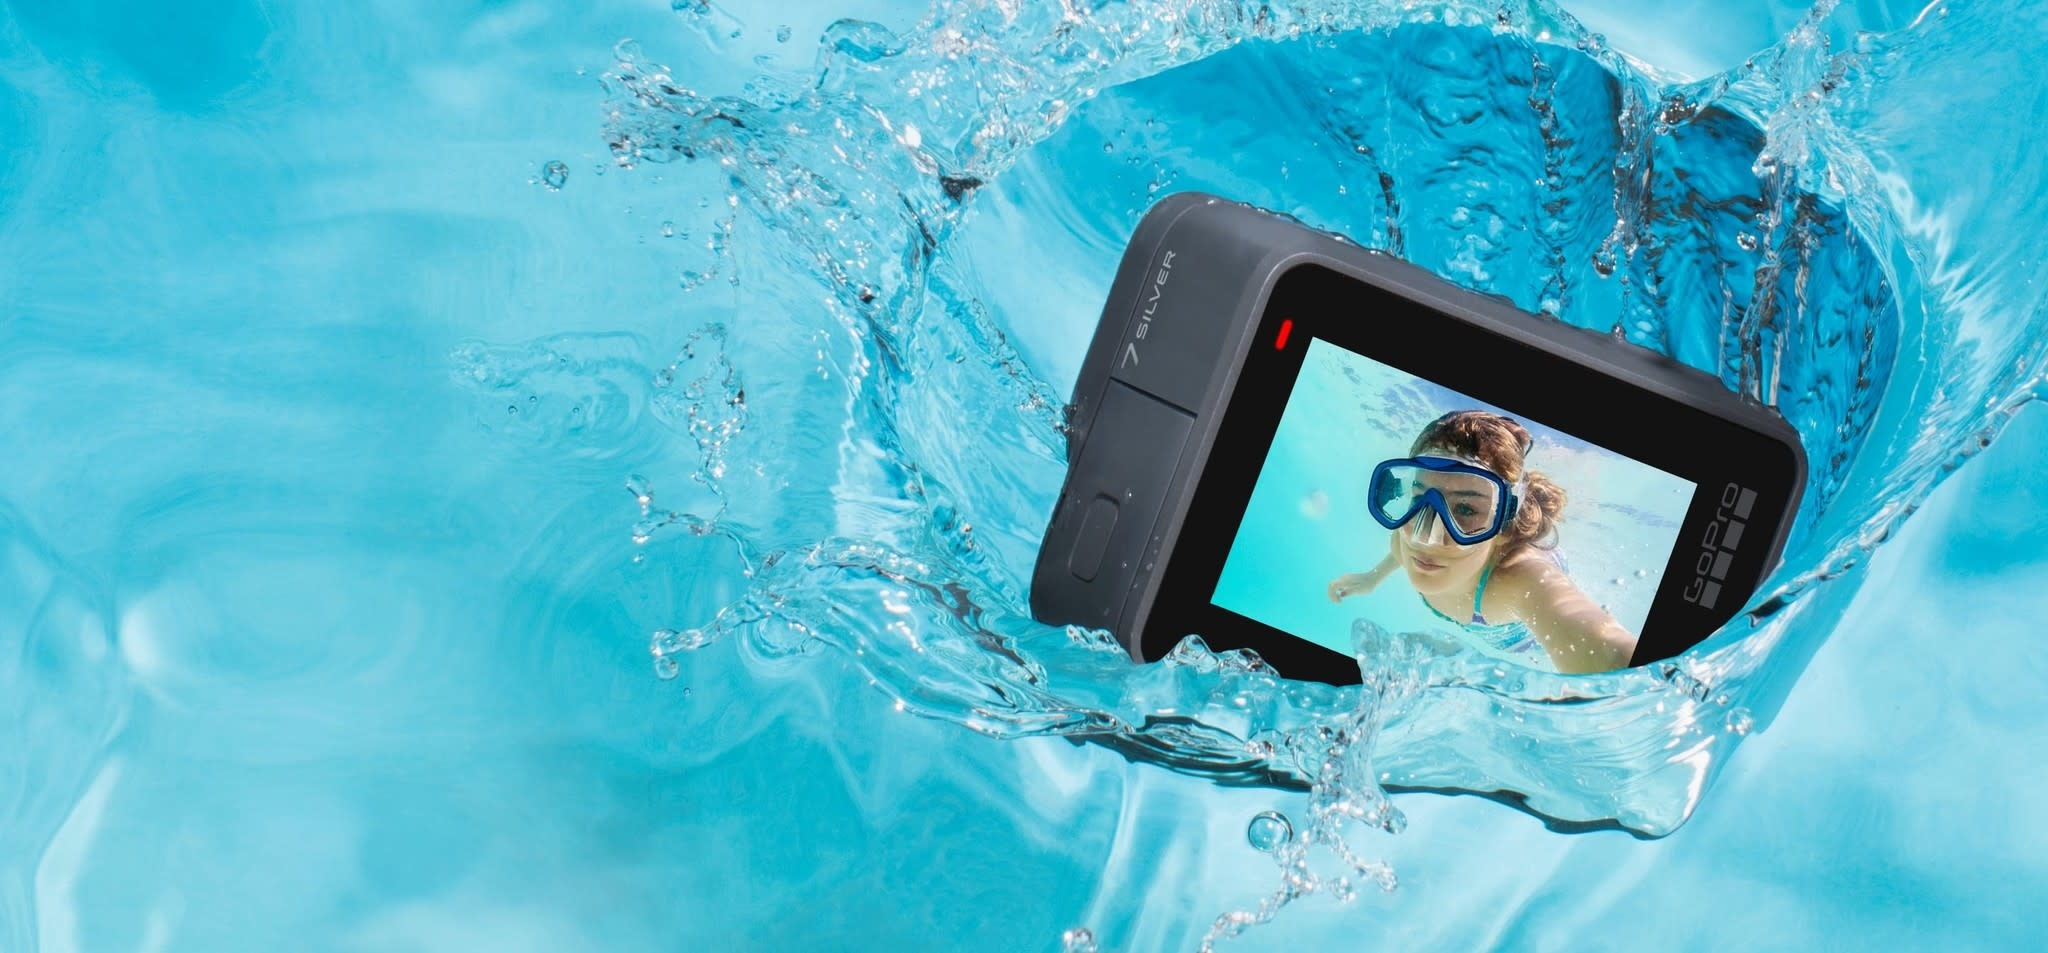 GoPro GoPro HERO7 Silver w/ SD Card